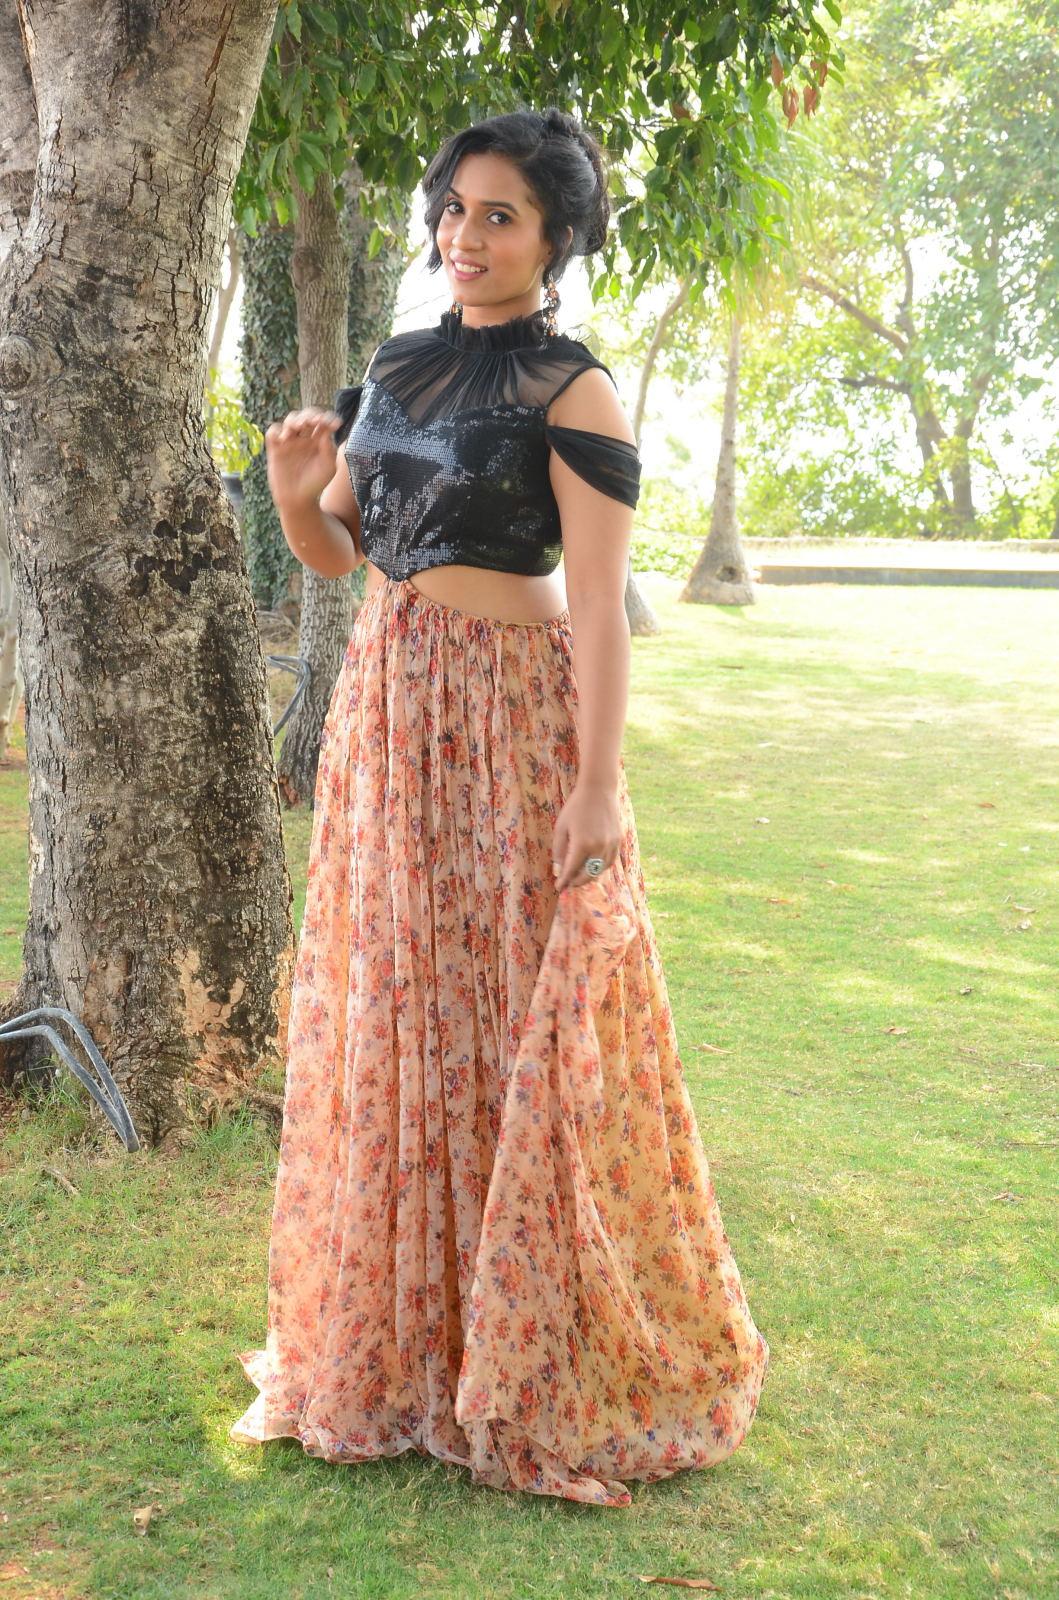 chetana uttej Brand New Photo Stills Of South Actress Chetana Uttej | Tollywood Chetana Uttej 4